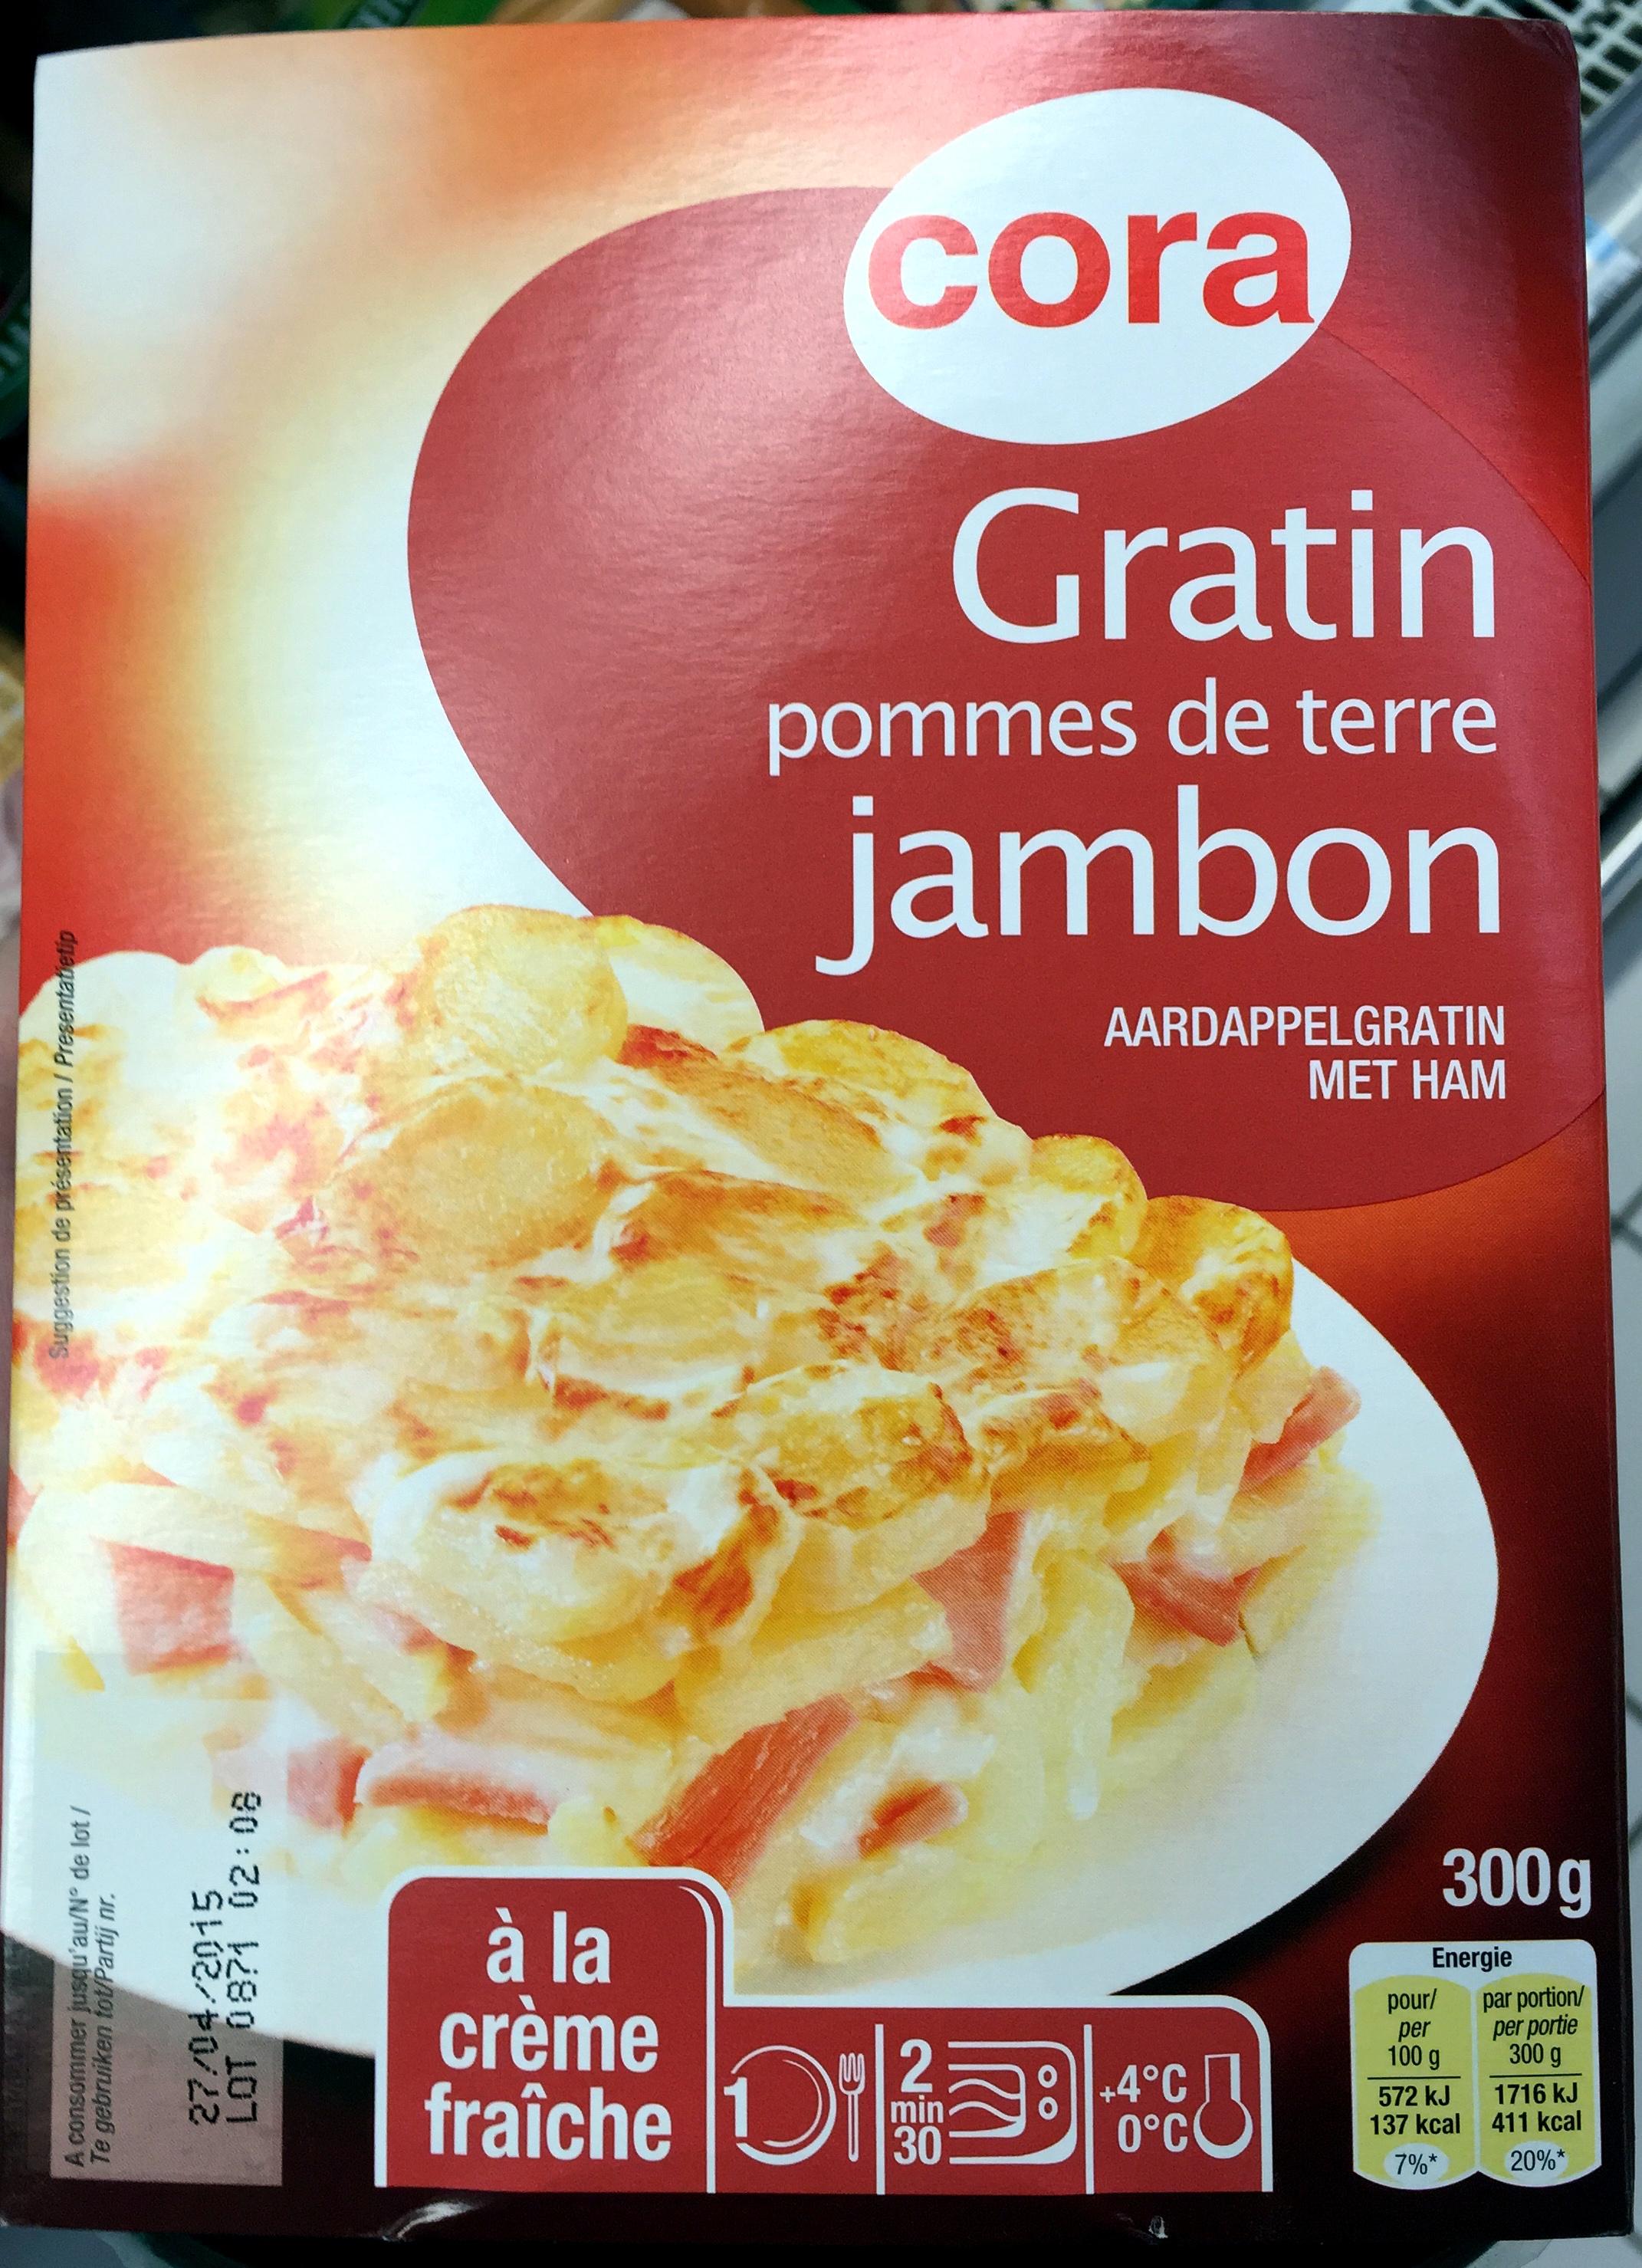 Gratin pommes de terre jambon la cr me fra che cora - Gratin de pomme de terre jambon ...